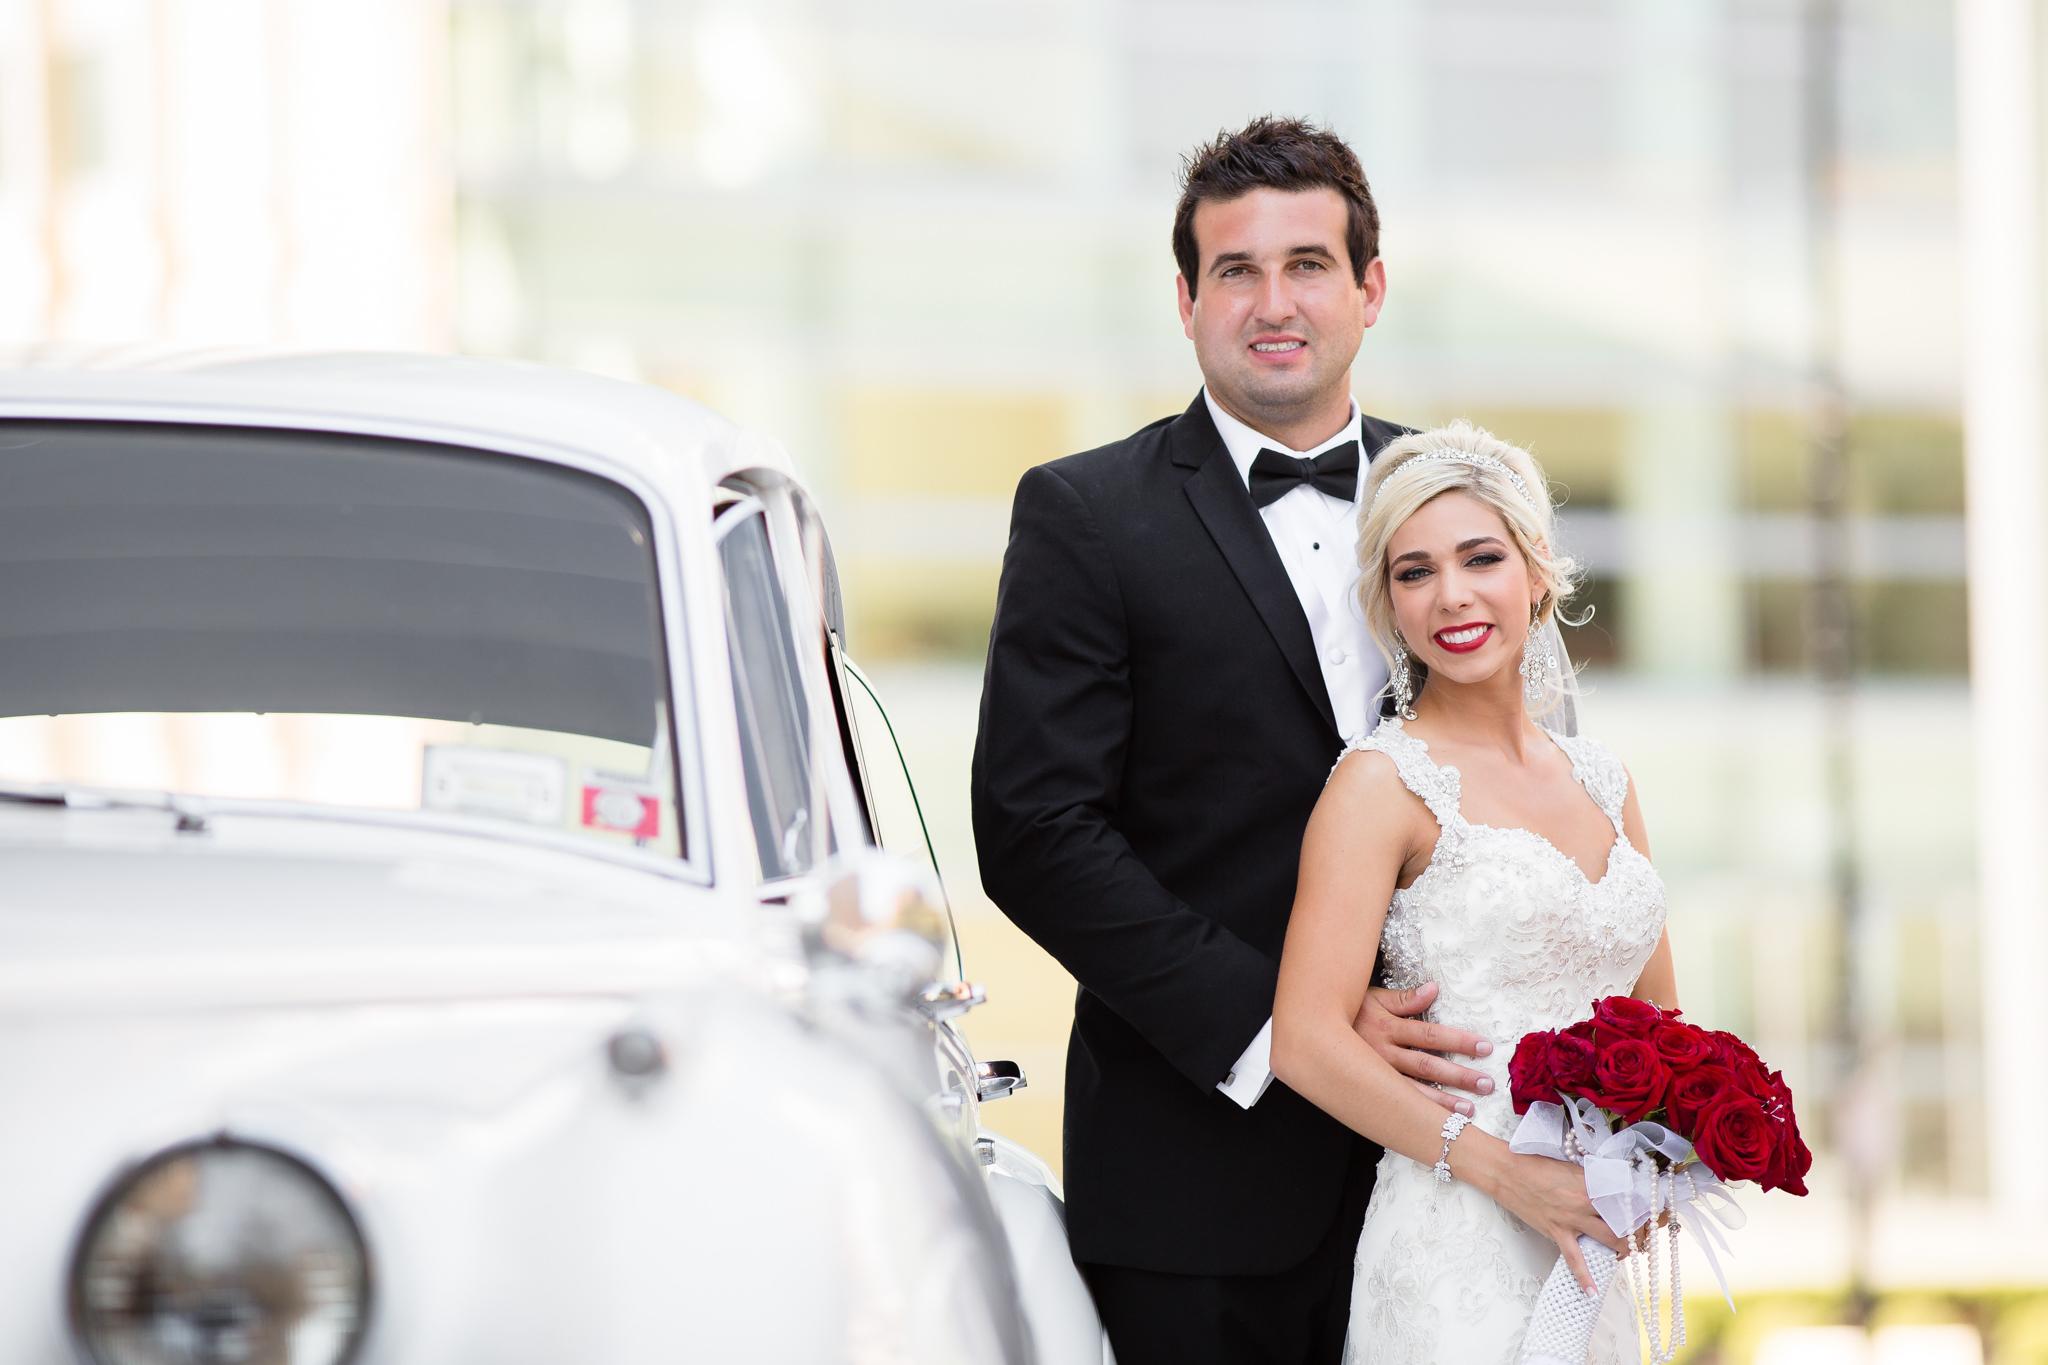 Statler-City-Buffalo-wedding-photographer- 0344.jpg